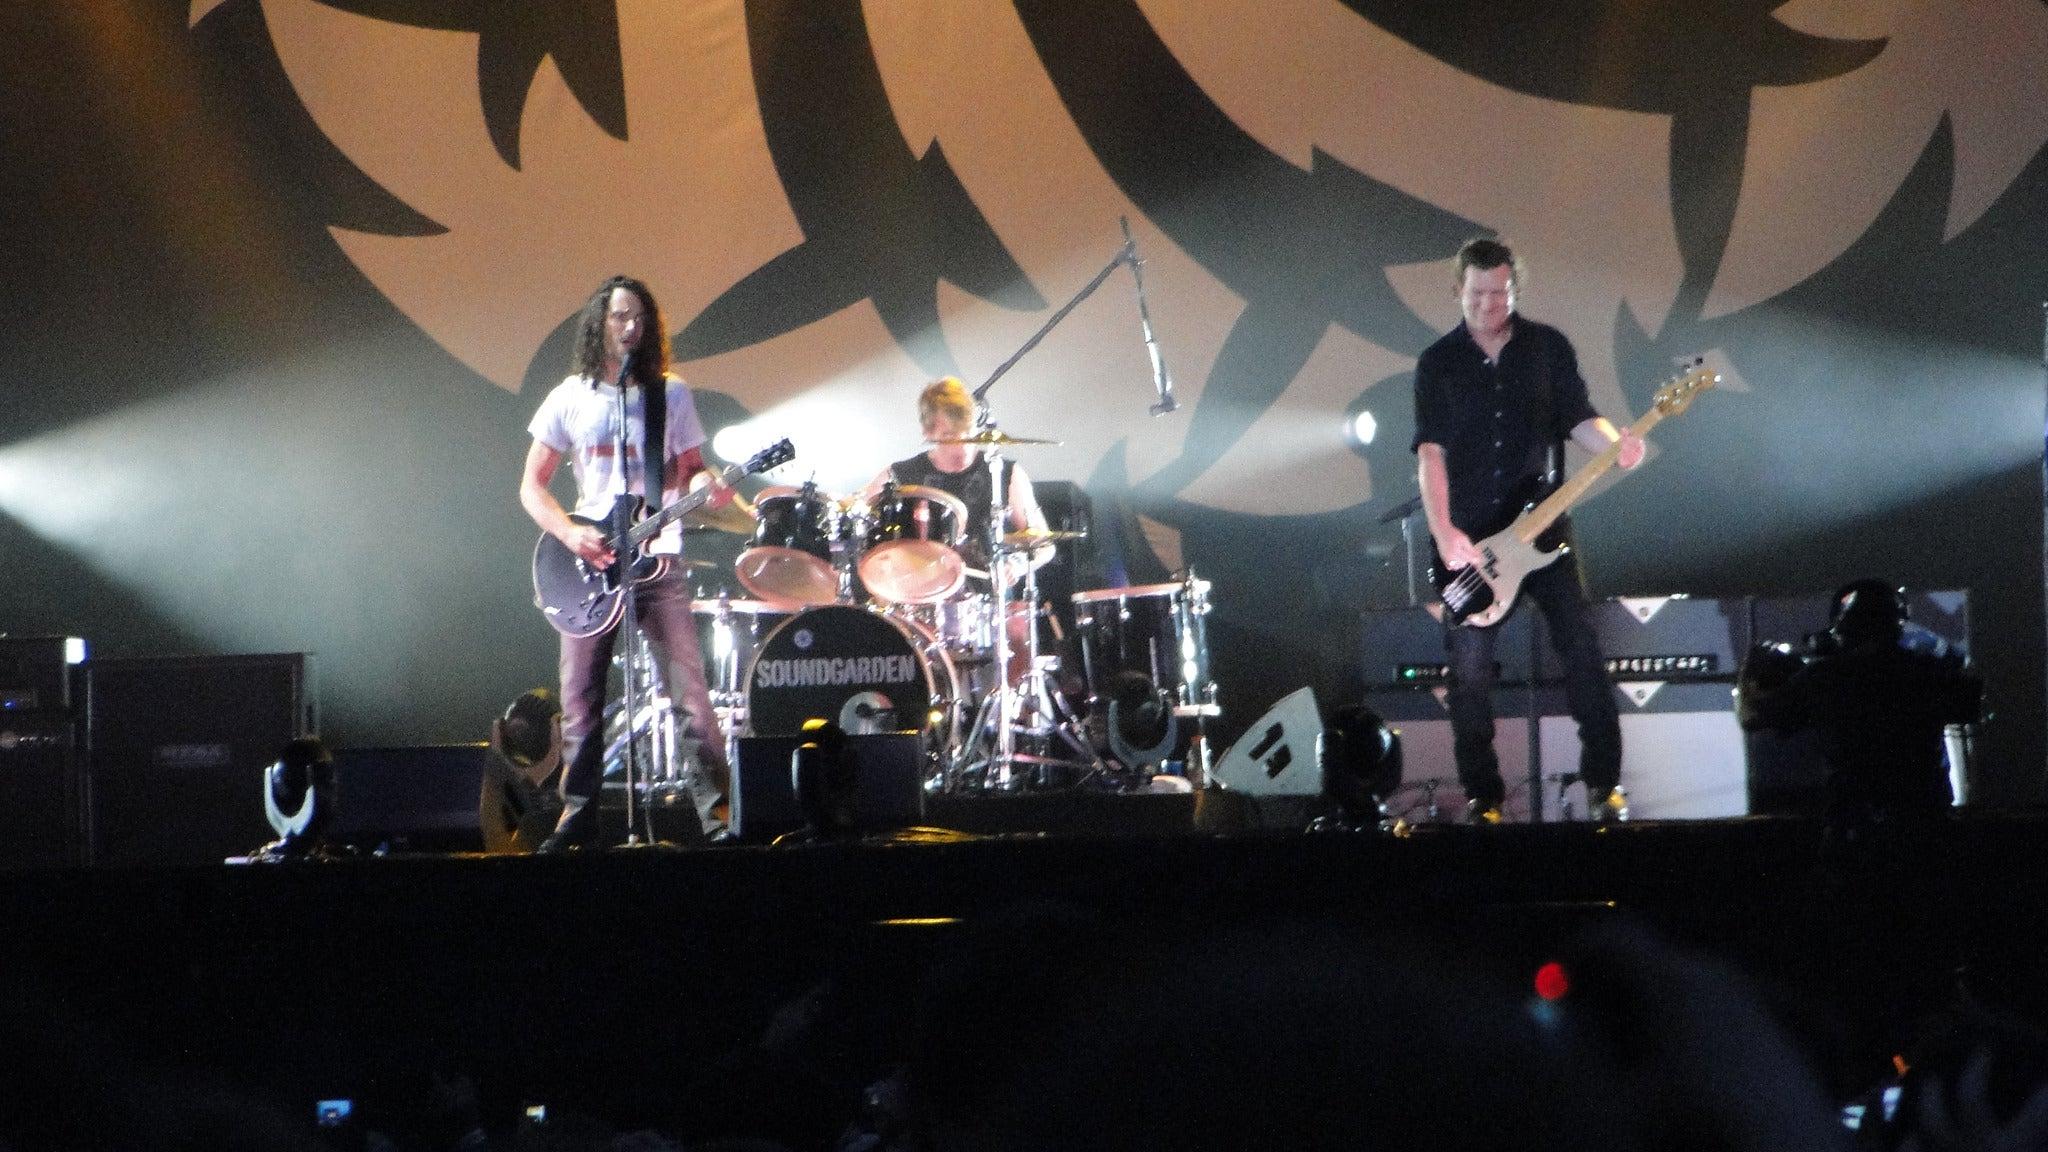 Soundgarden at Tuscaloosa Amphitheater